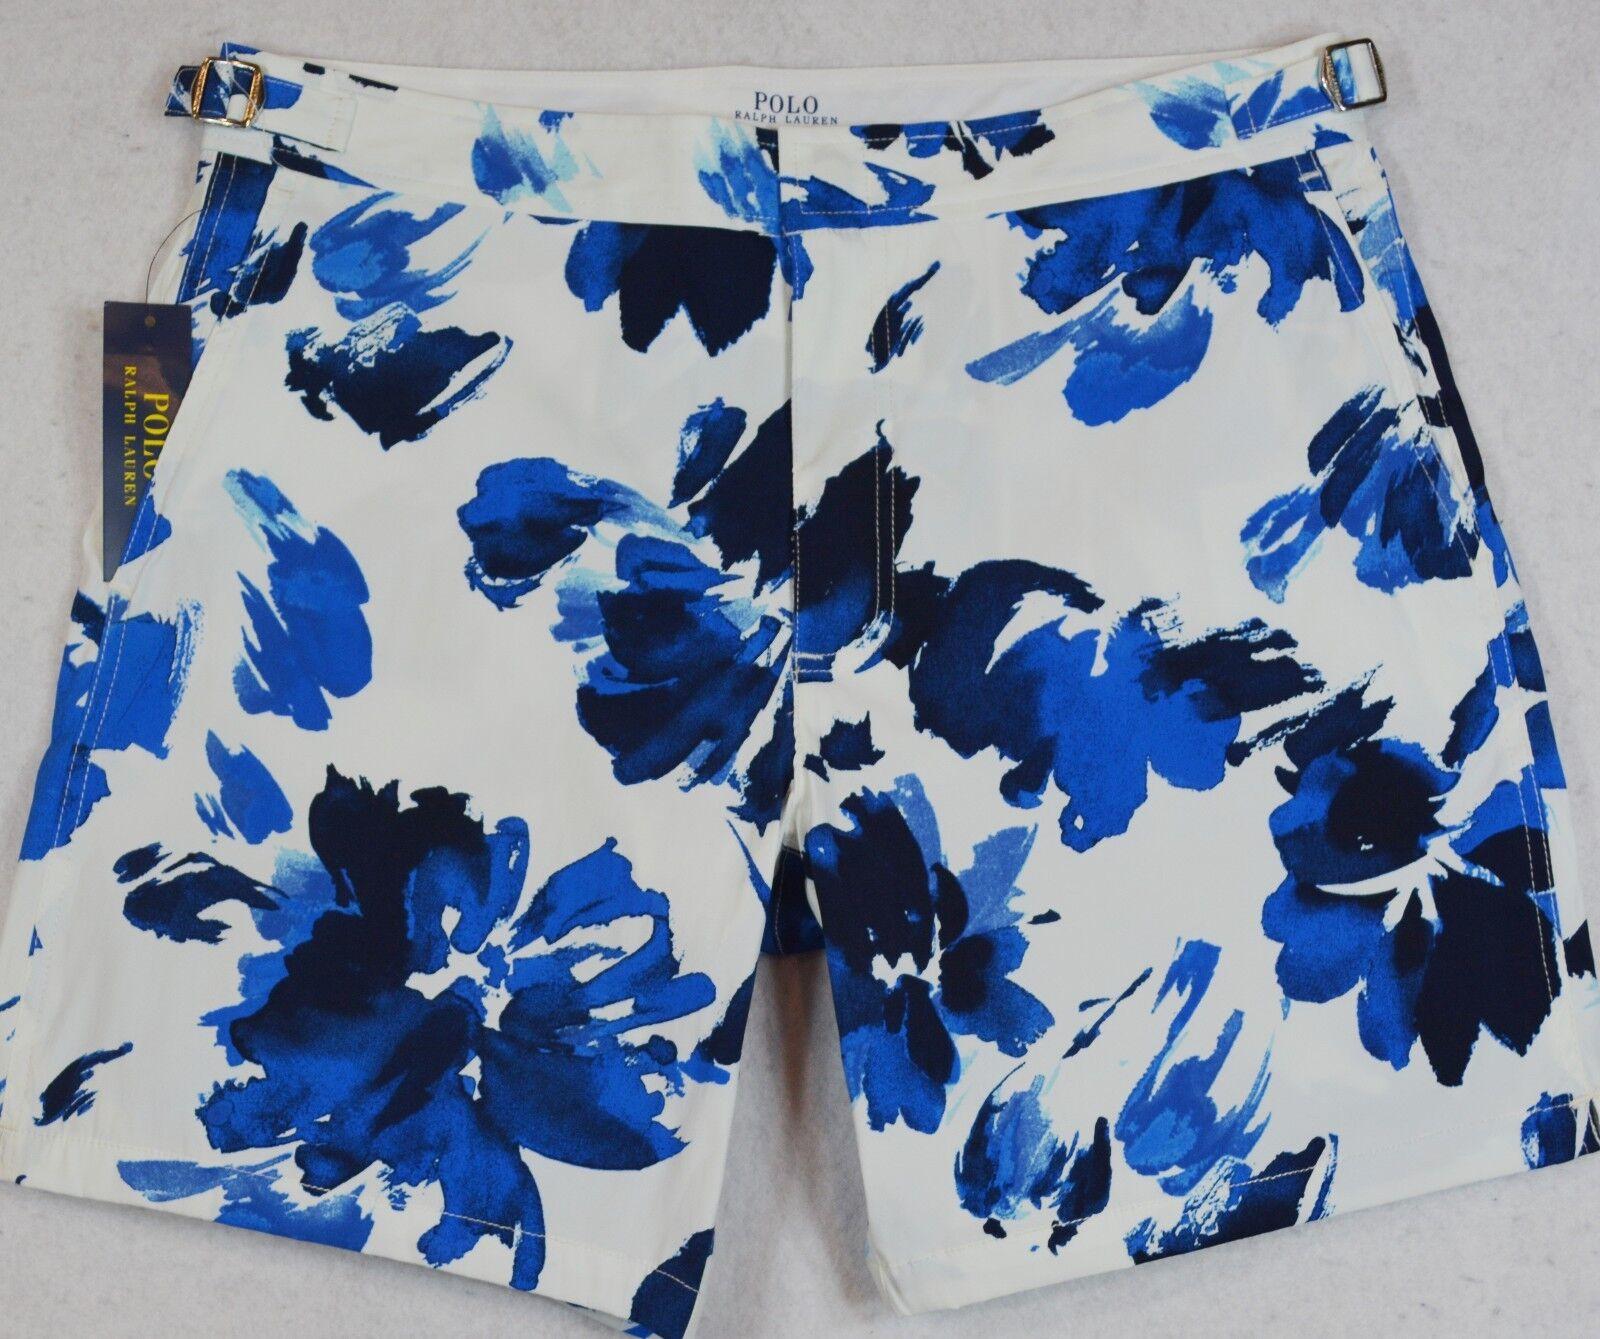 Polo Ralph Lauren Swim Trunks Board Shorts Monaco Floral 40 NWT